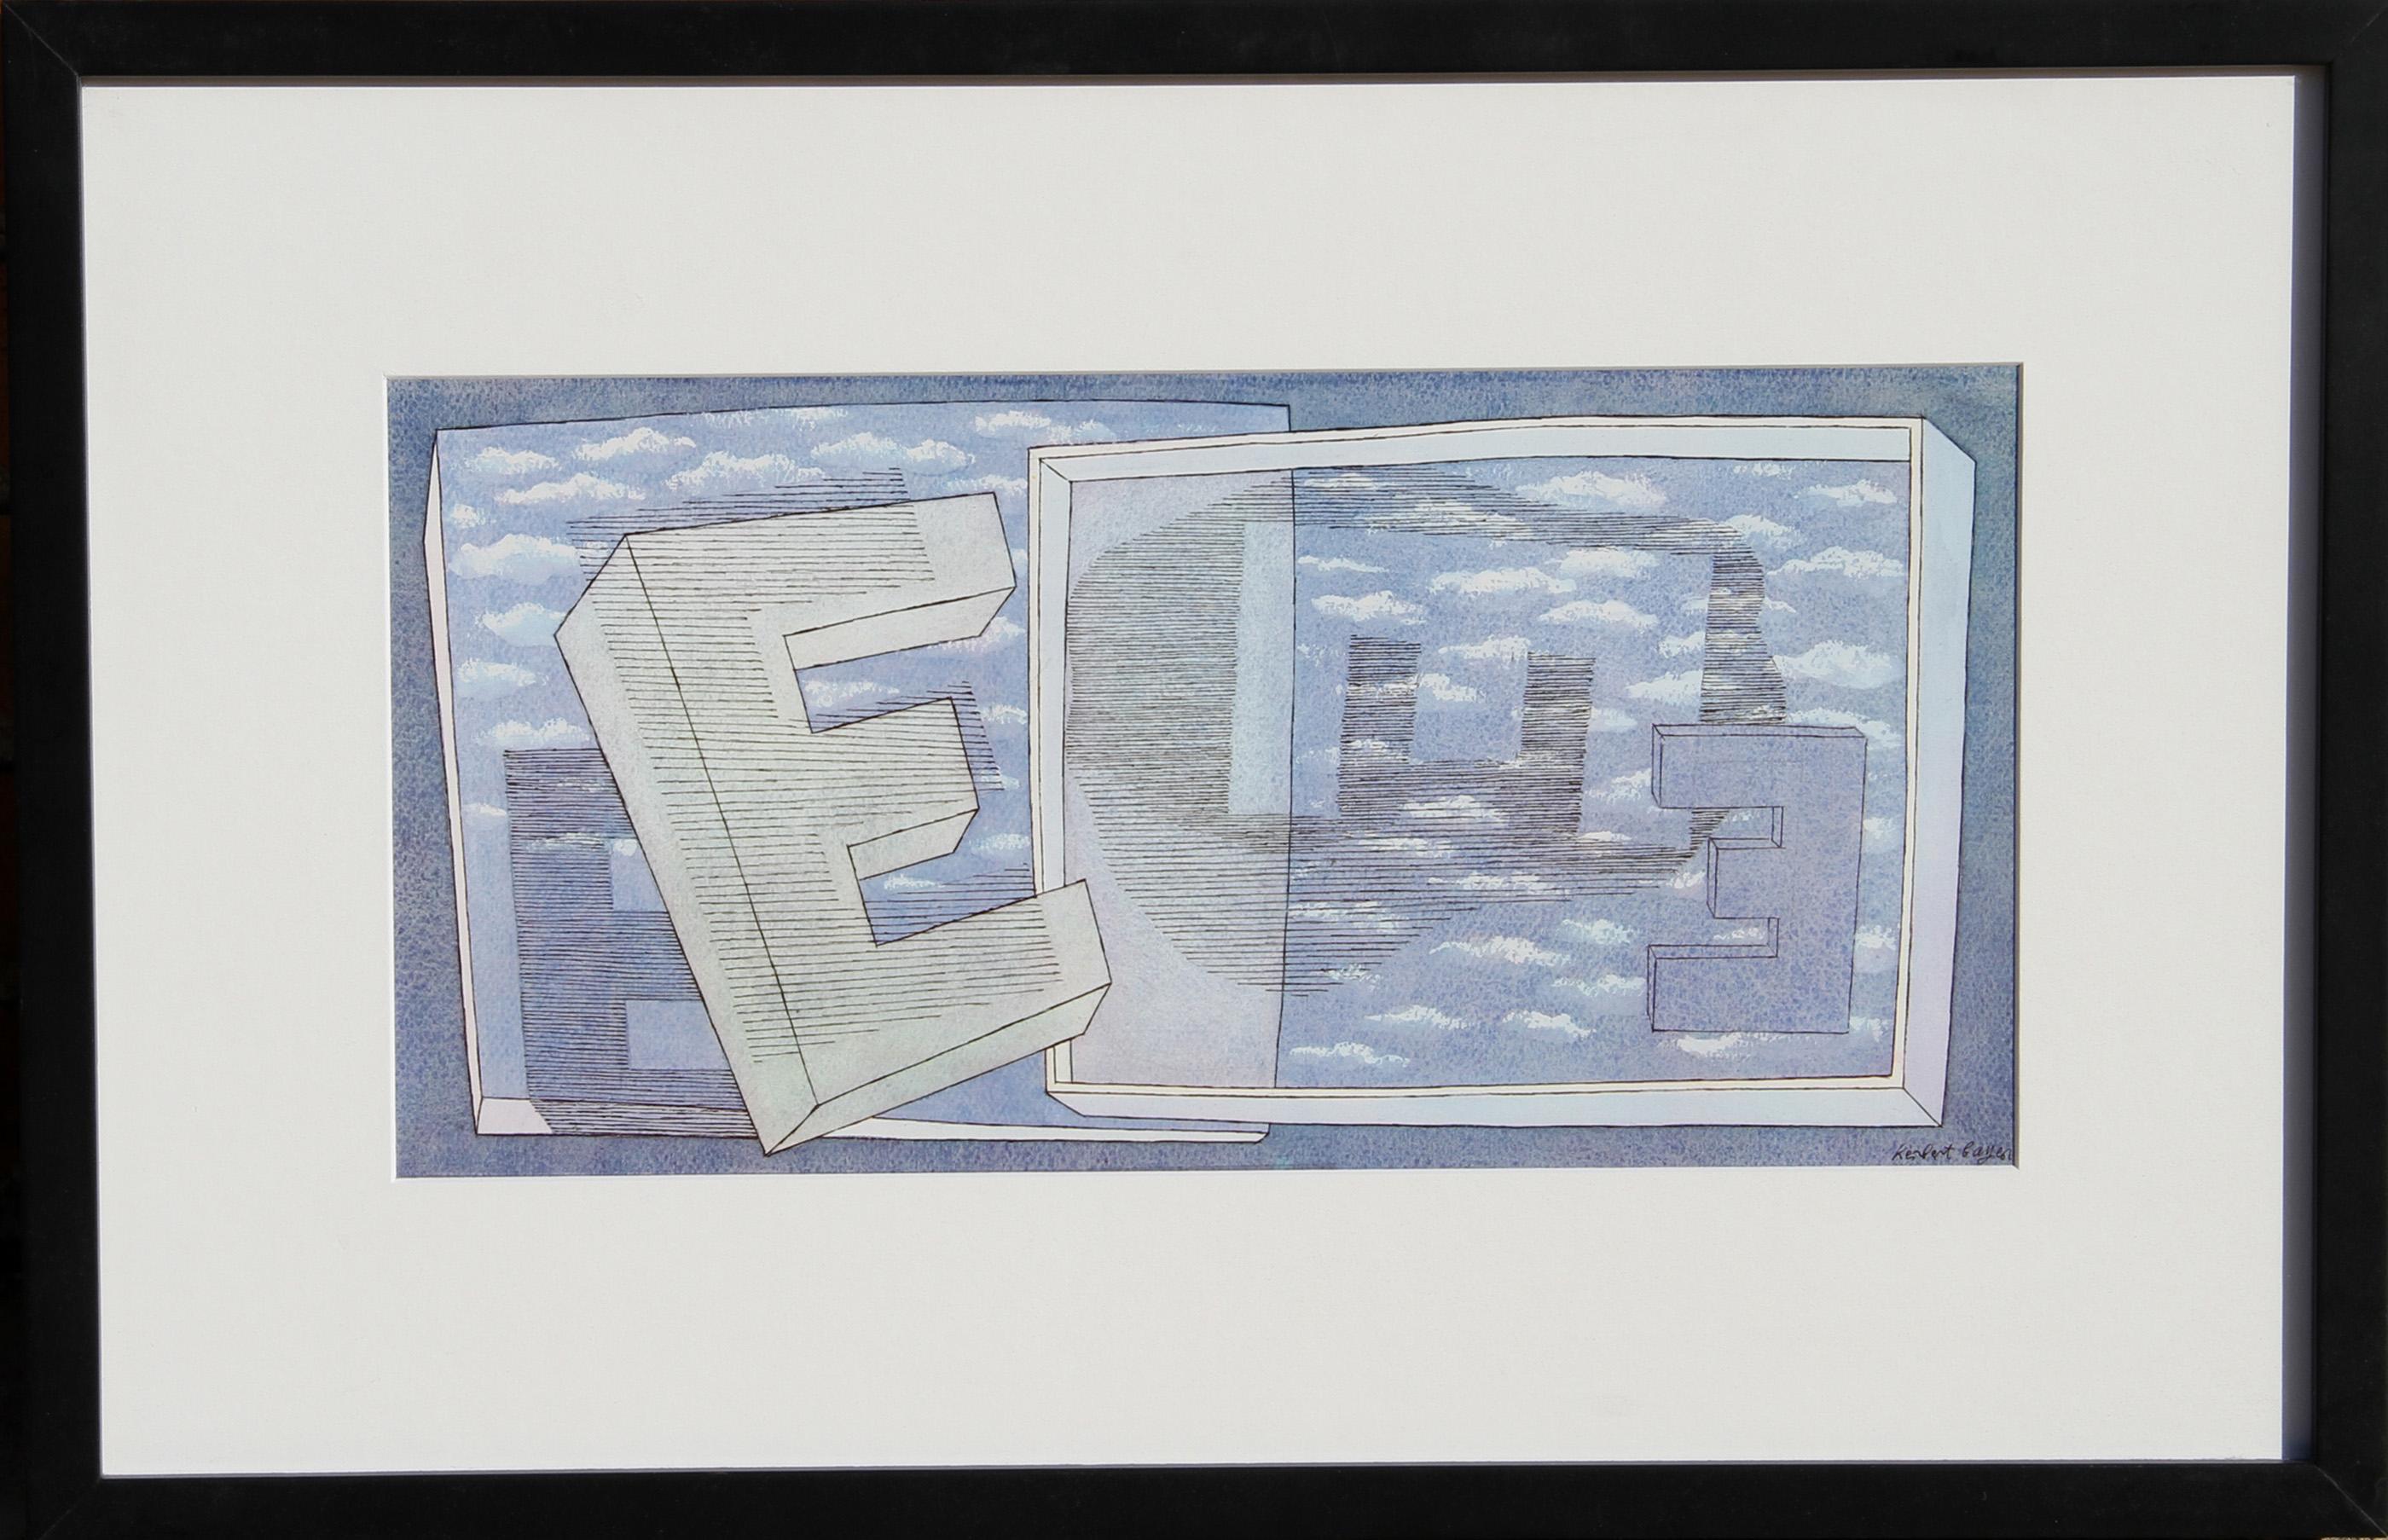 Herbert Bayer, Tender Picture E, Offset Lithograph